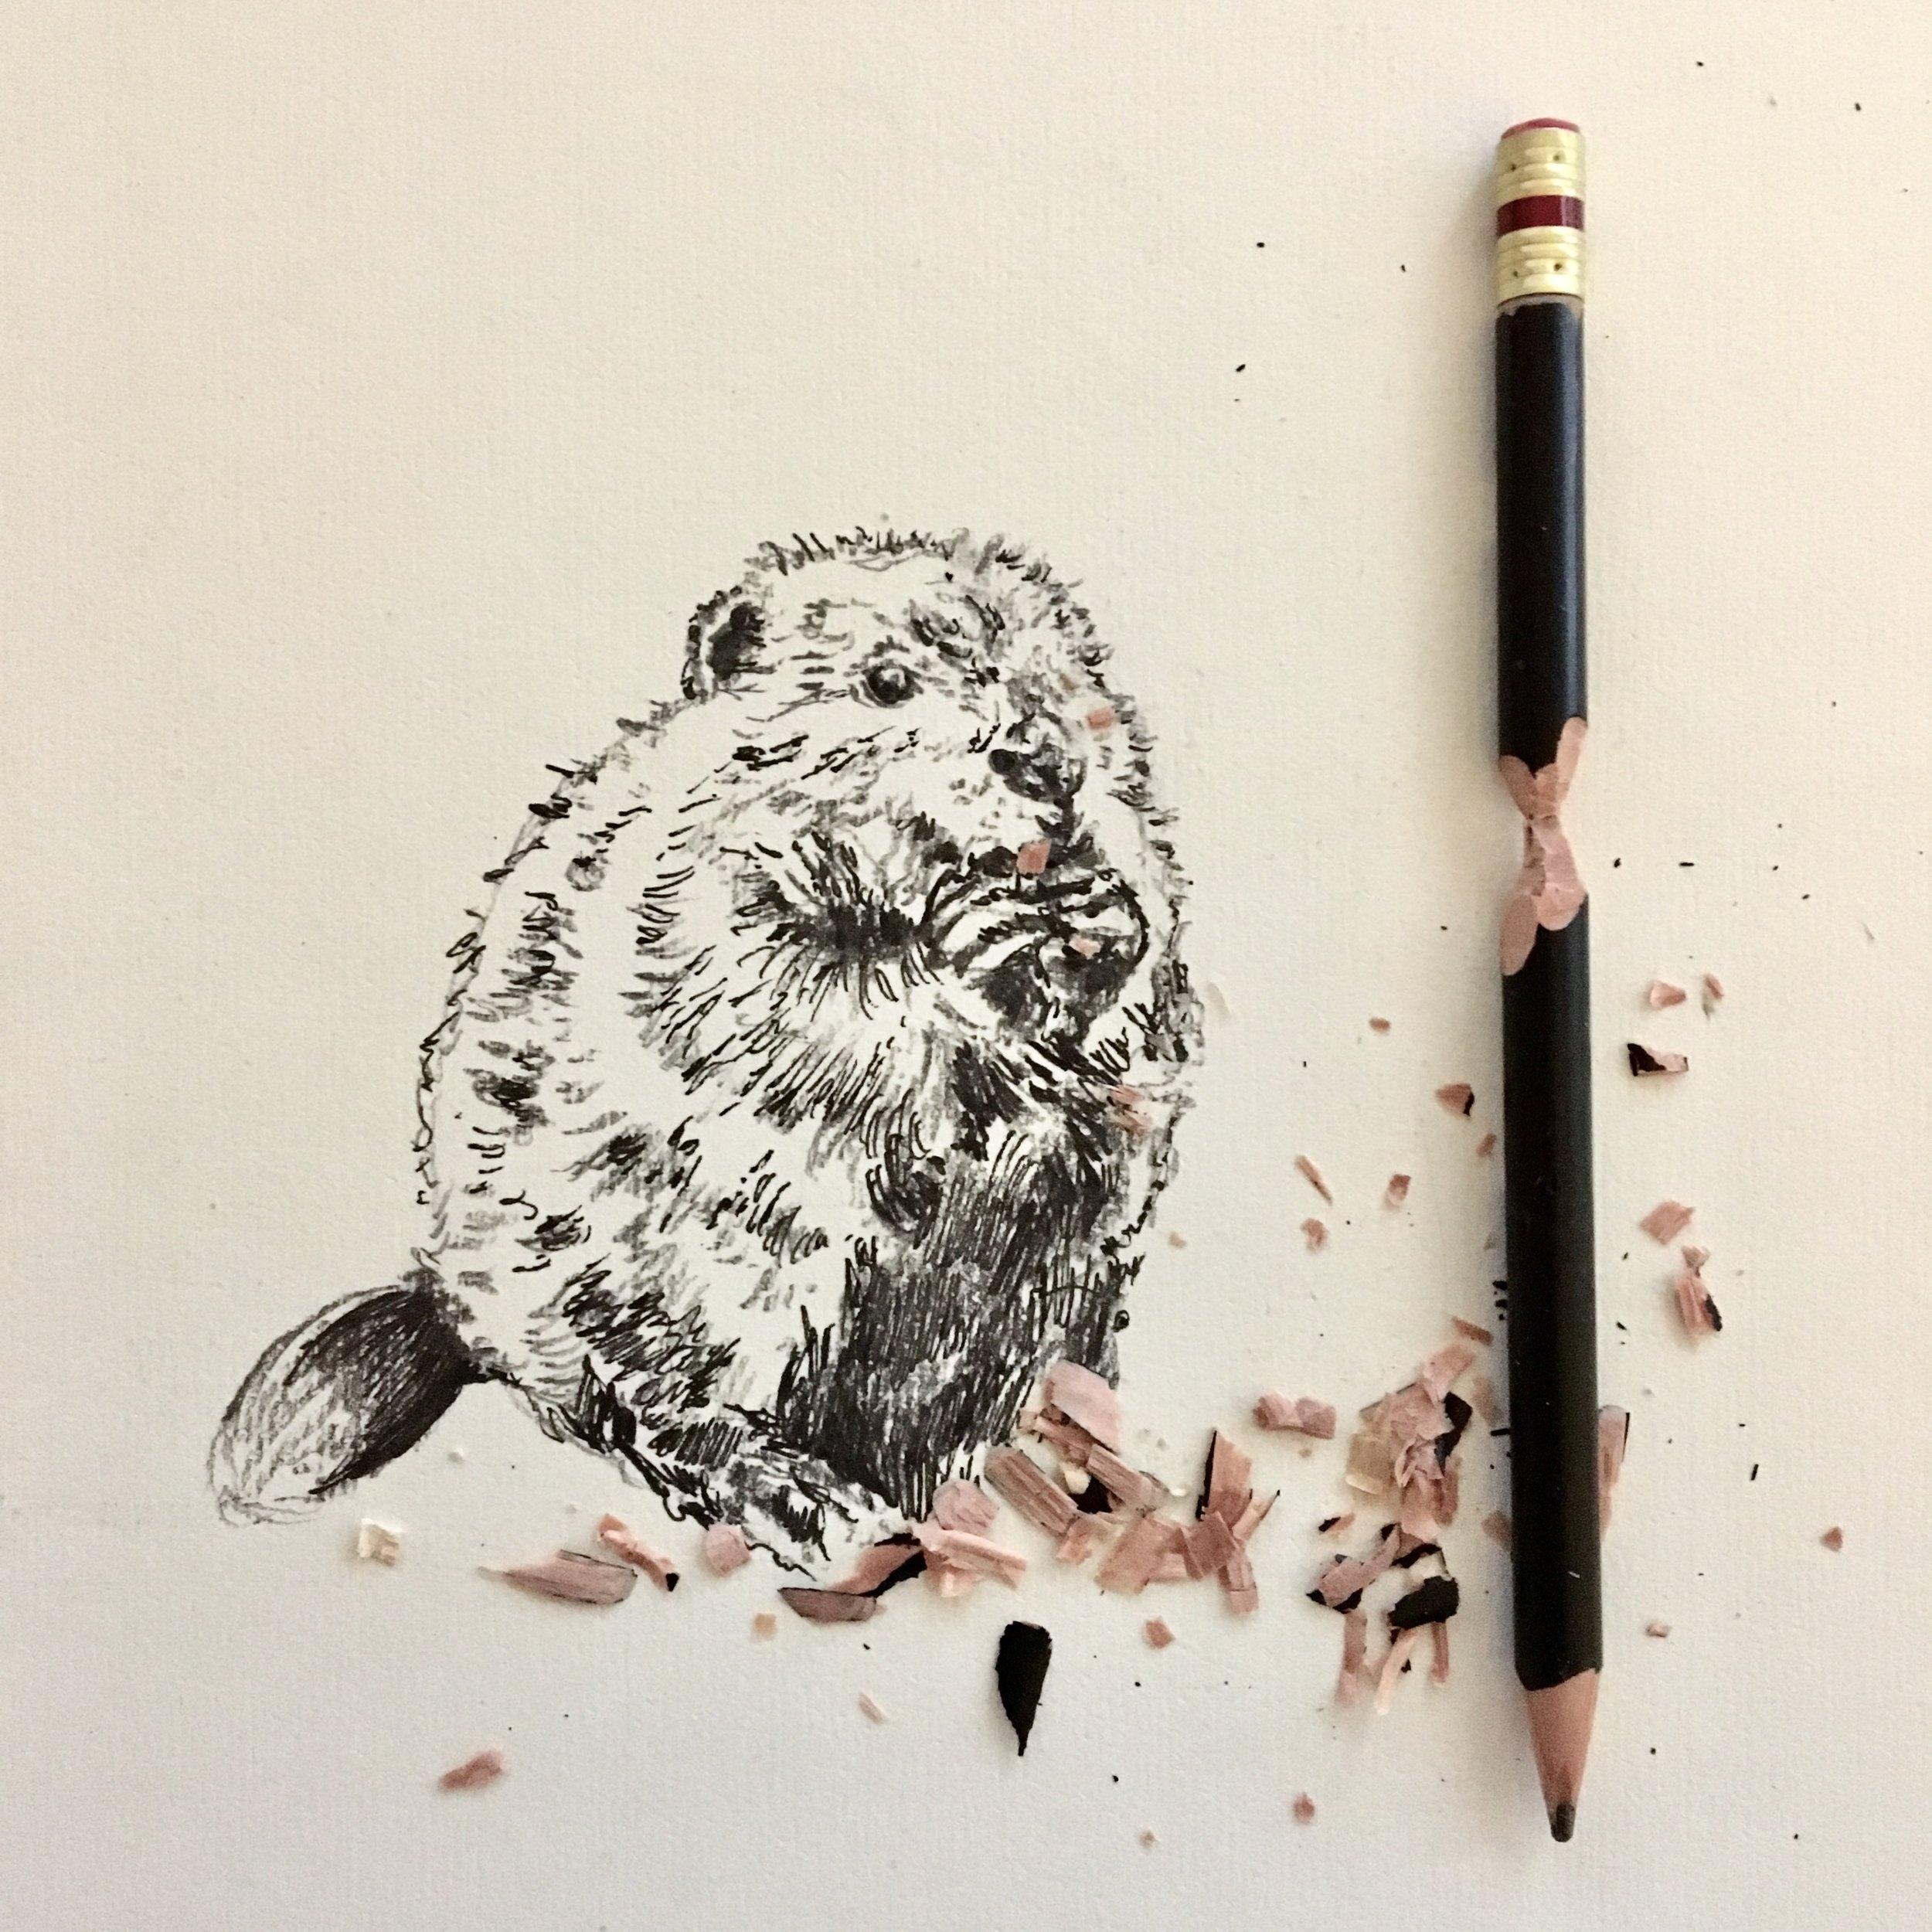 beaver-interactive-drawing-by-jordan-fretz-art.jpg